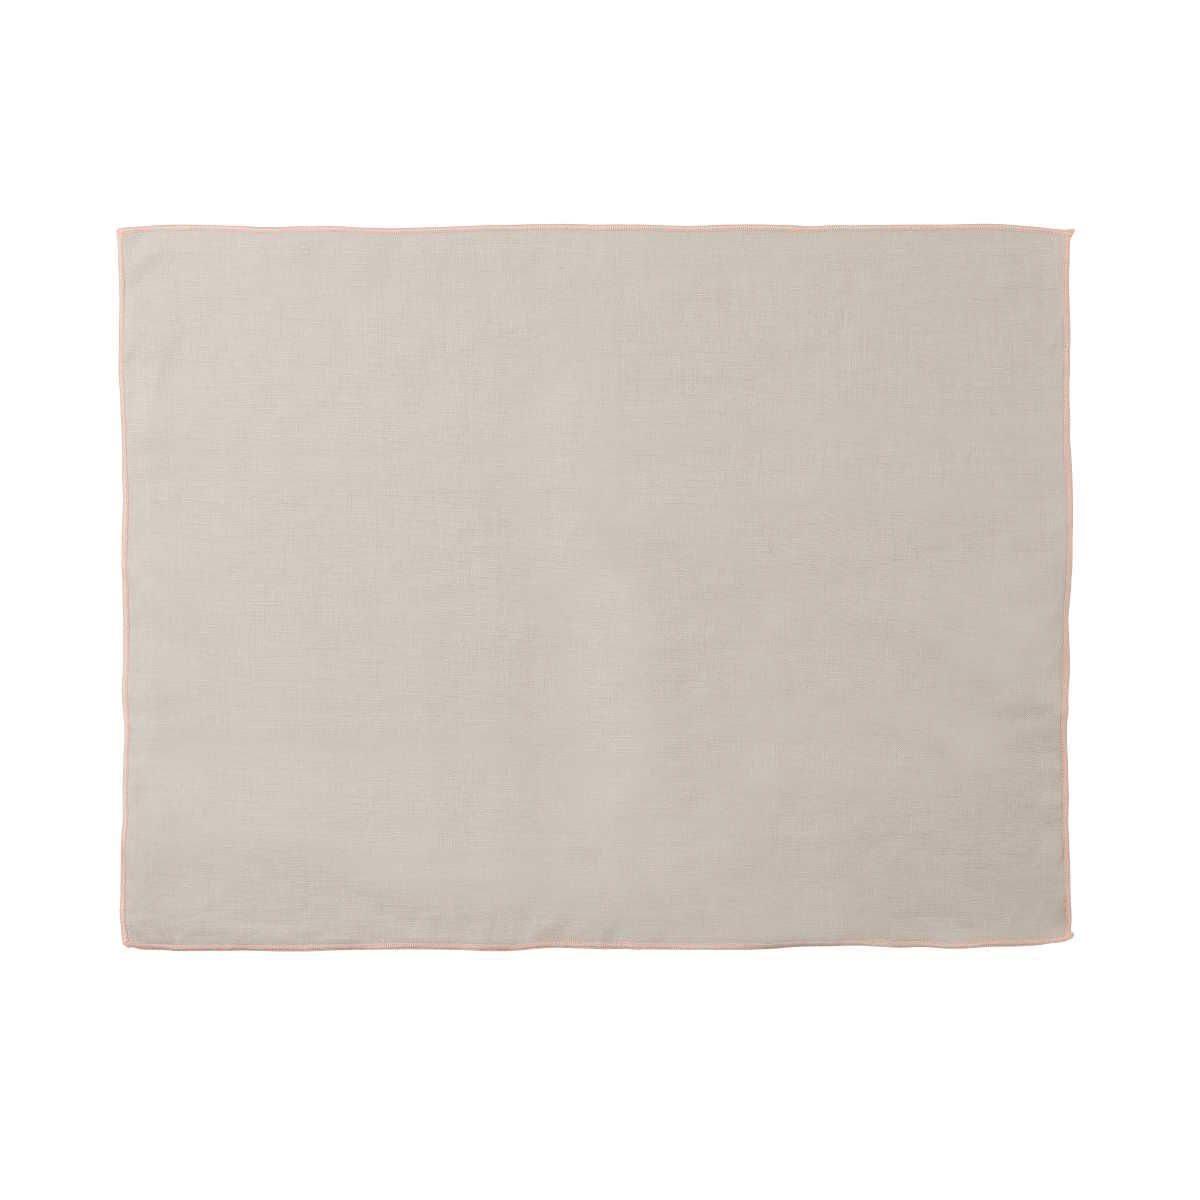 BUTLERS VARIADO »Tischset 35x47 cm«